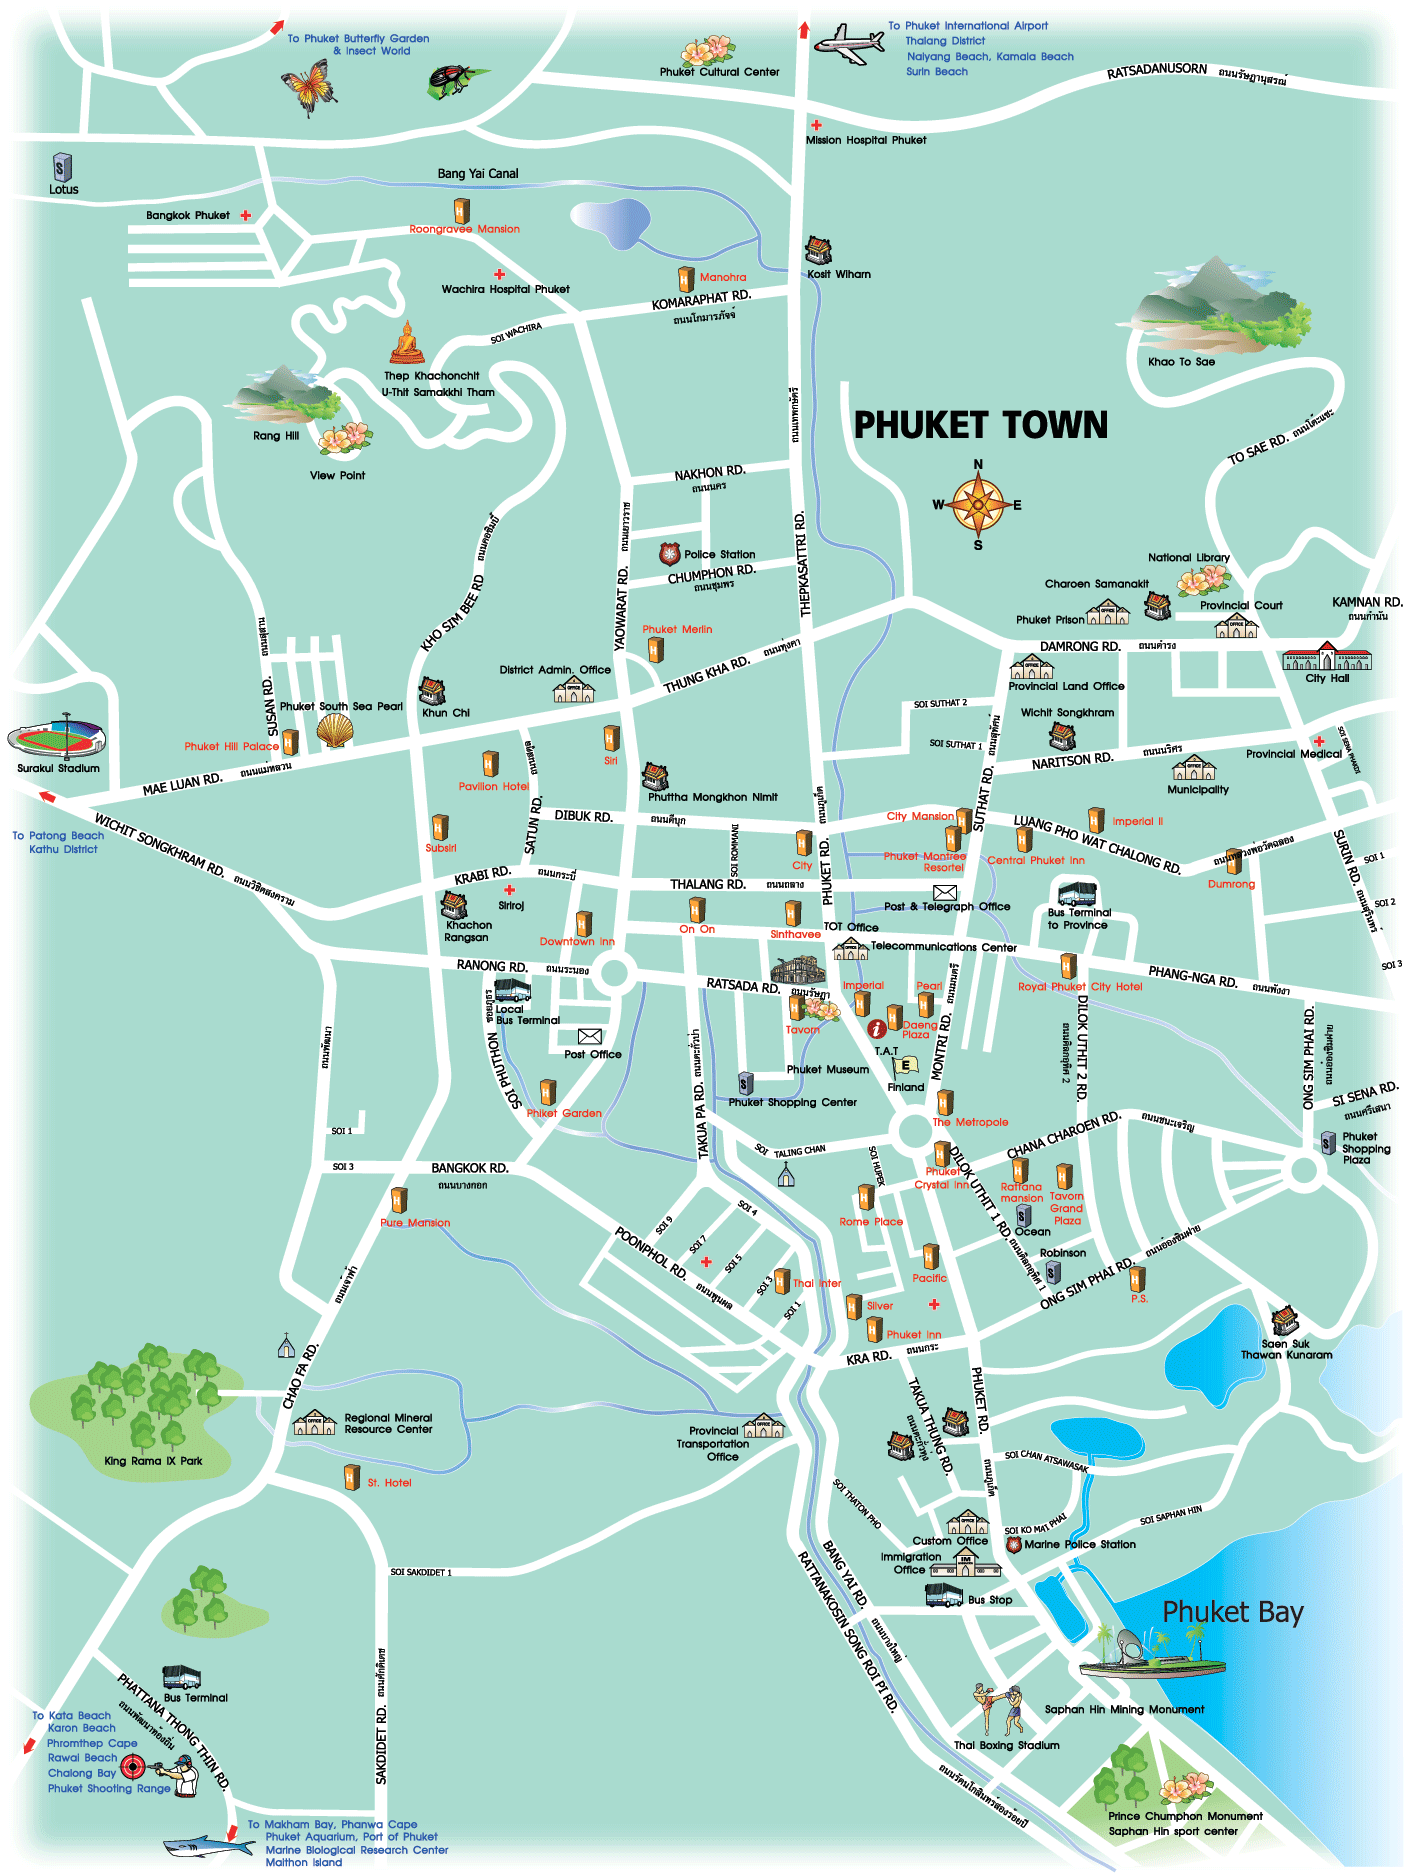 Phuket Town Tourist Map - Phuket Thailand • mappery